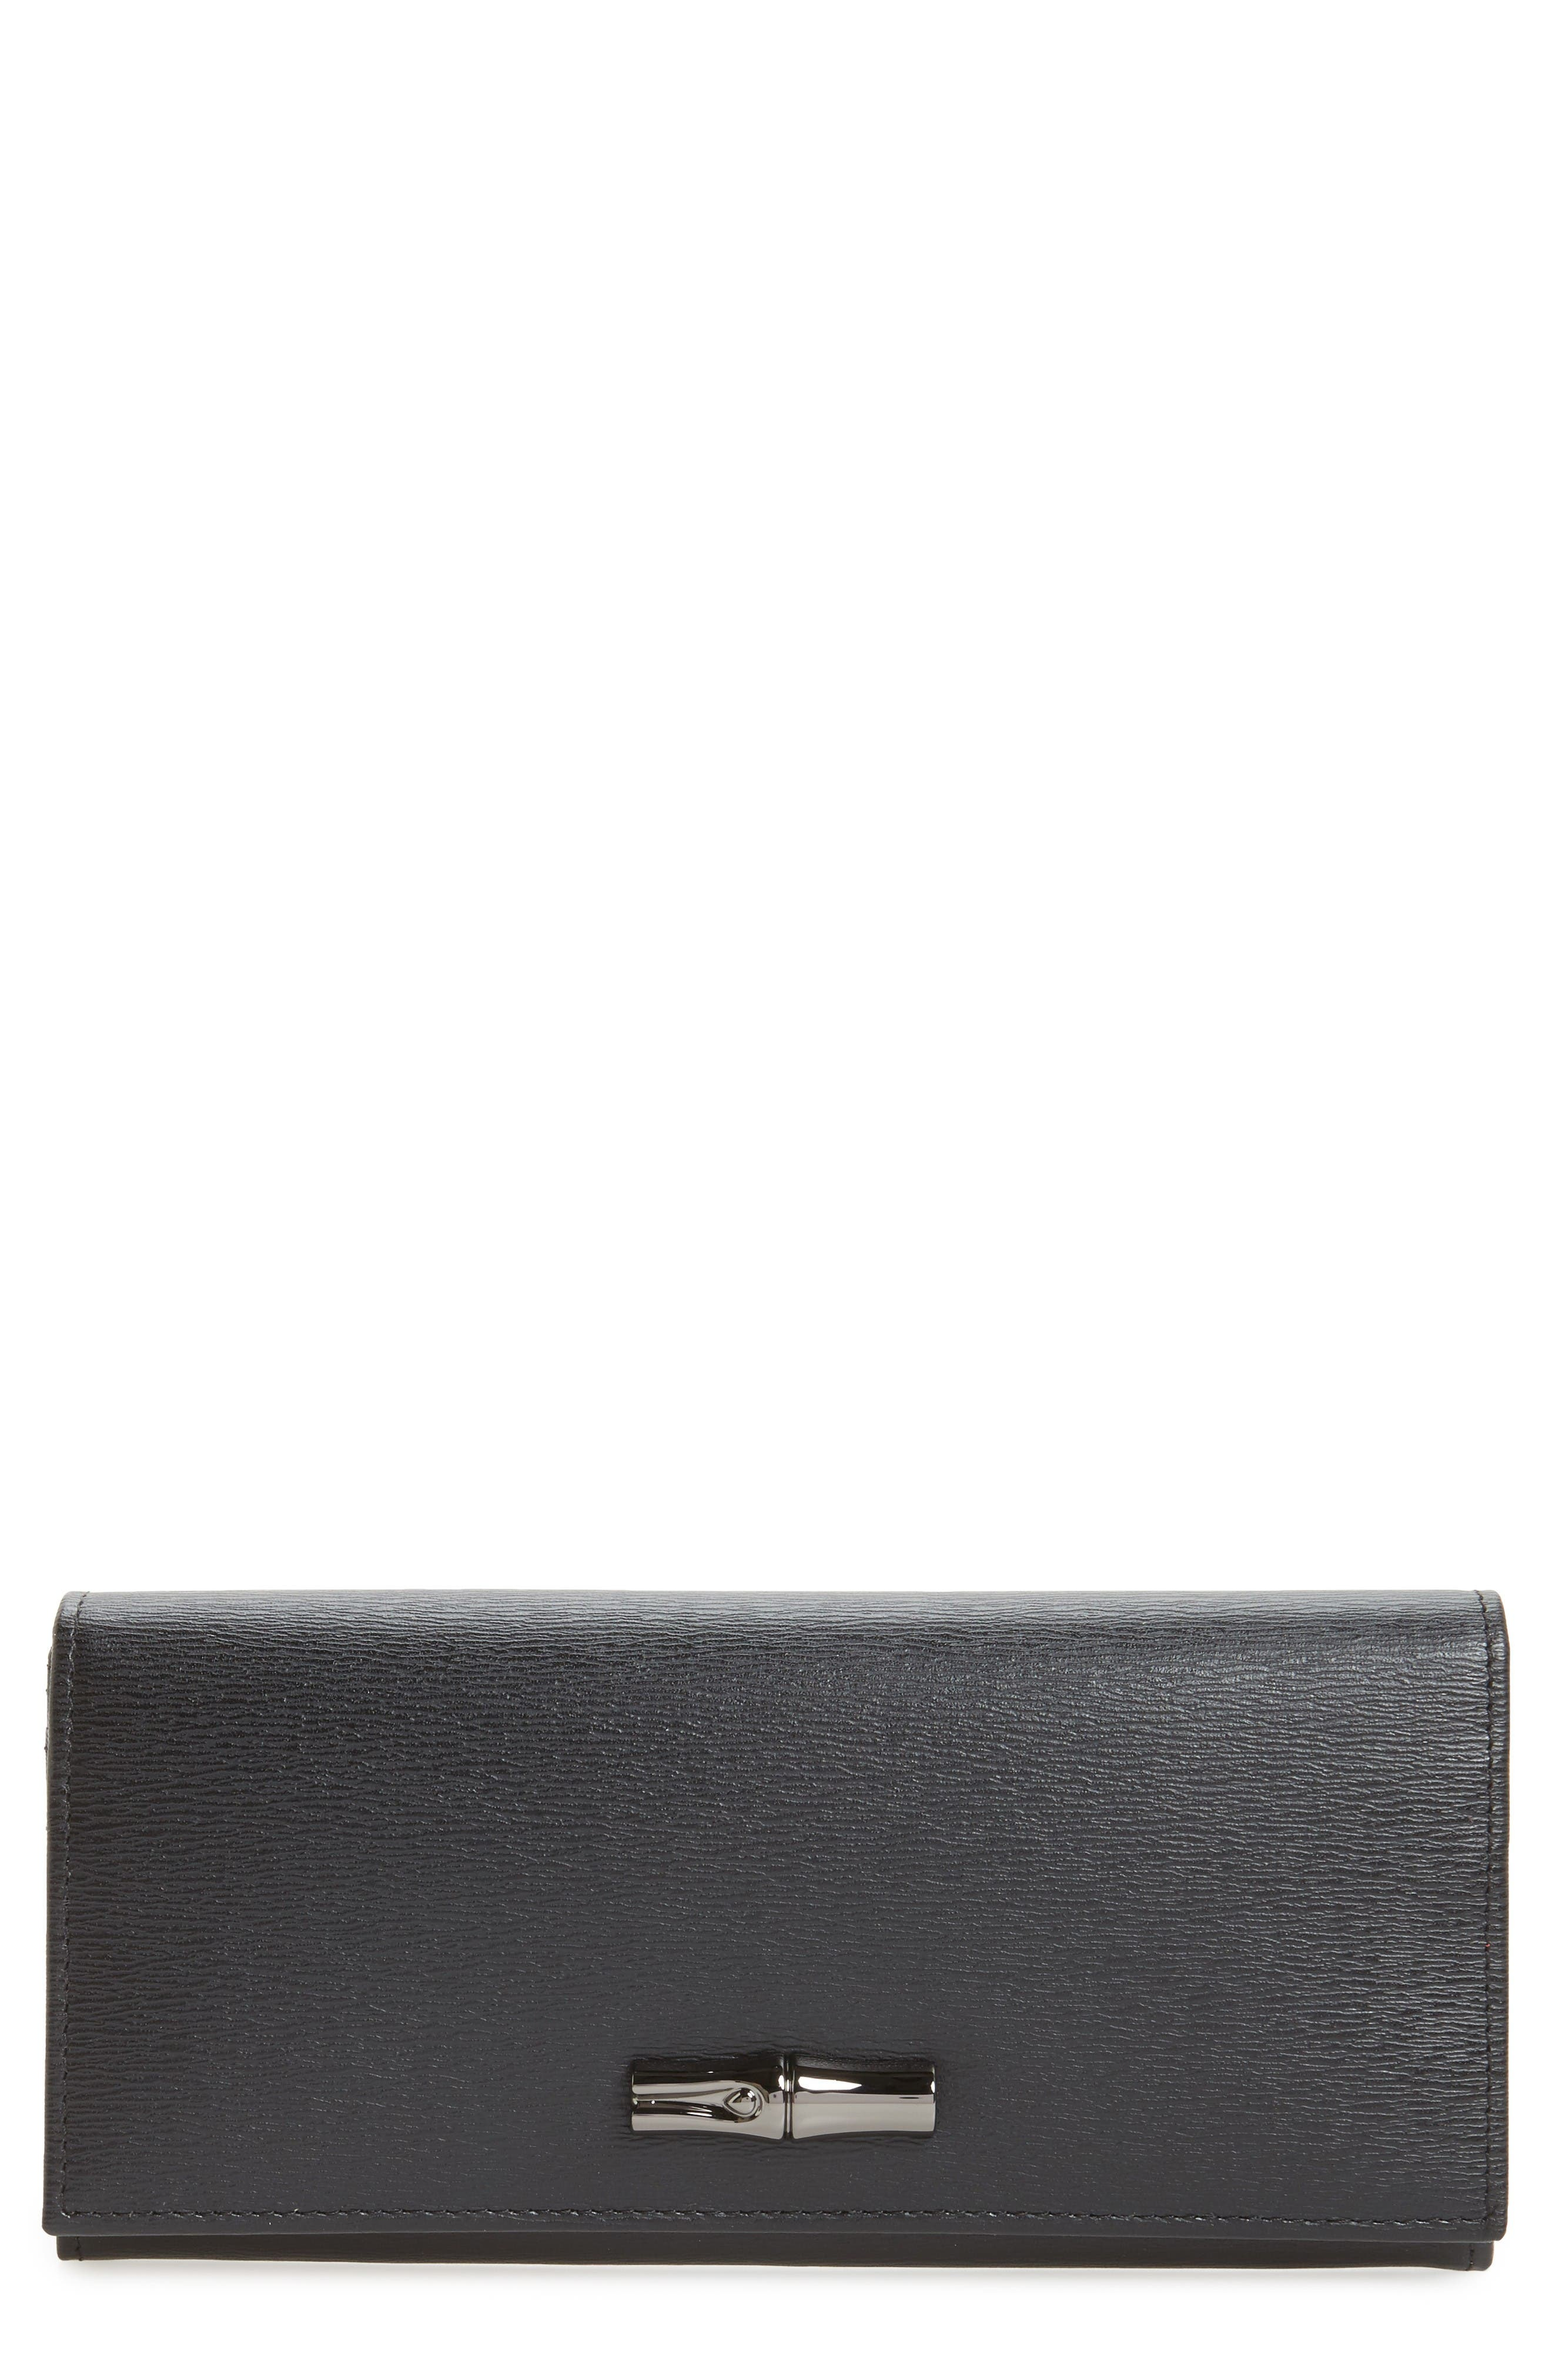 Longchamp Roseau Leather Continental Wallet